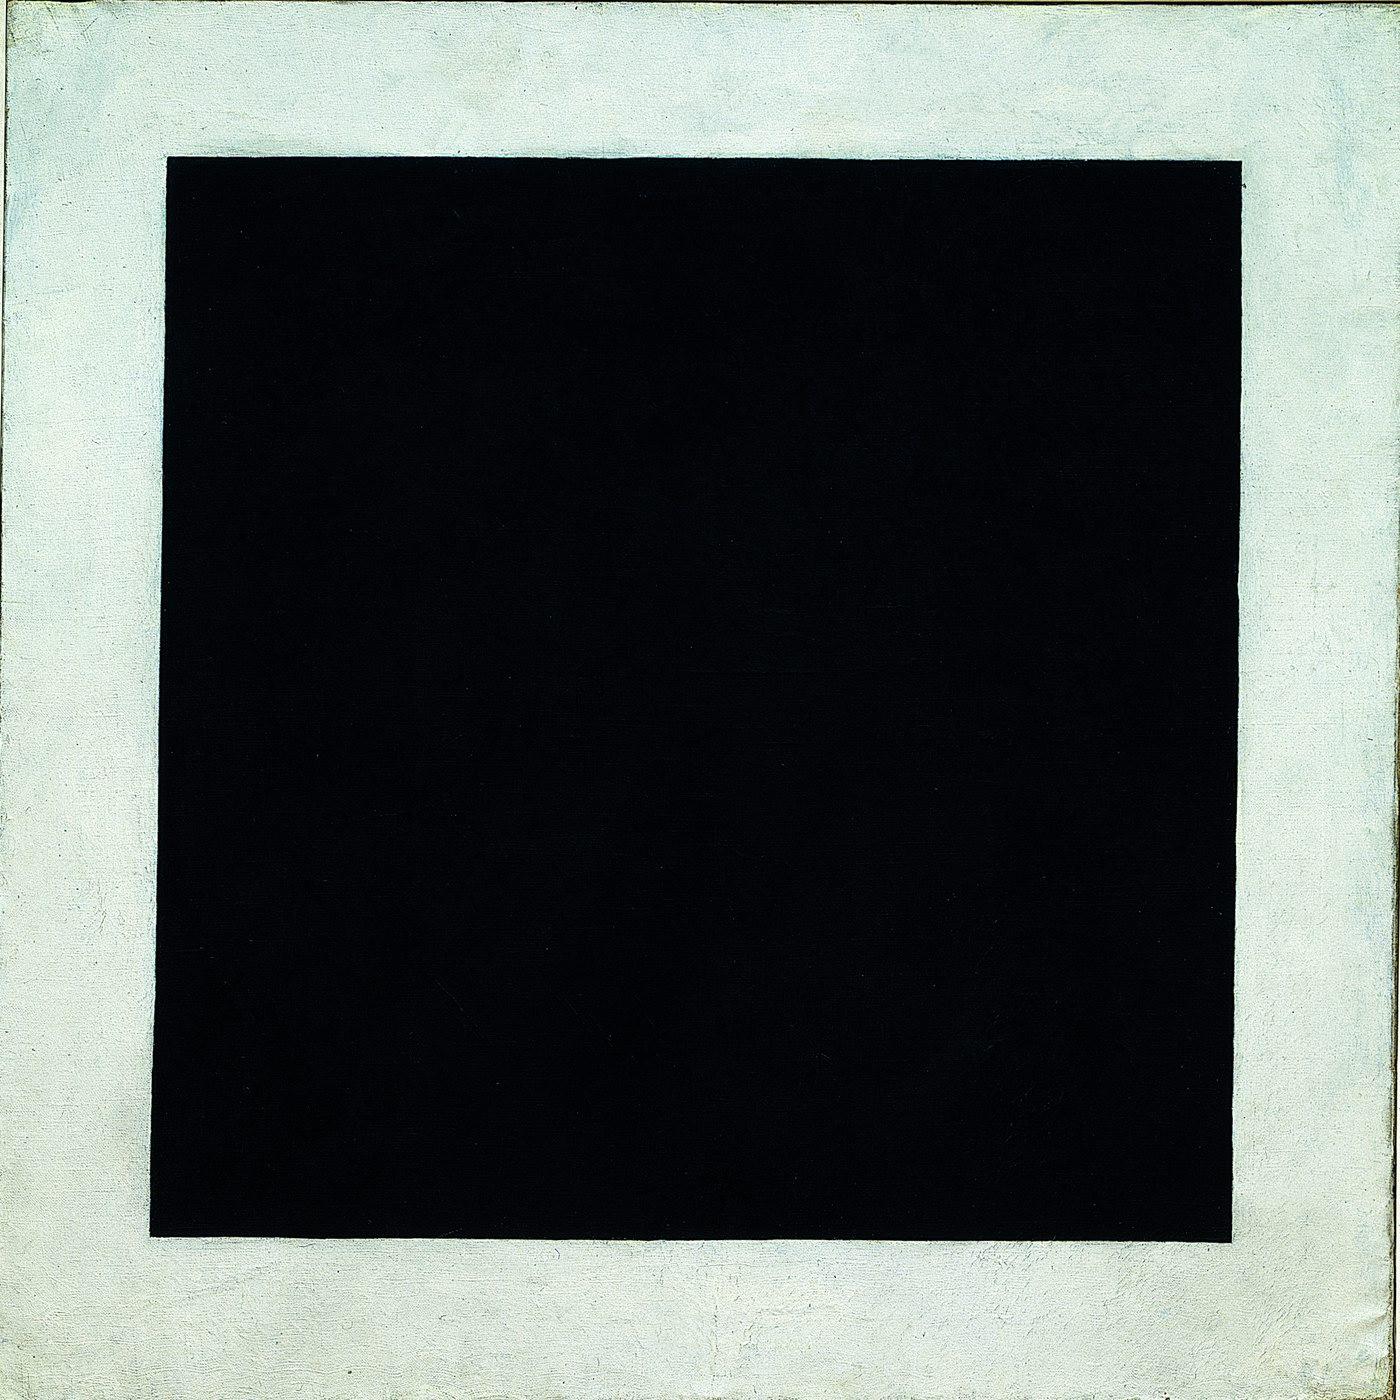 Malevich Black Square 1913 Kazimir severinovich malevichMalevich Black Square 1913